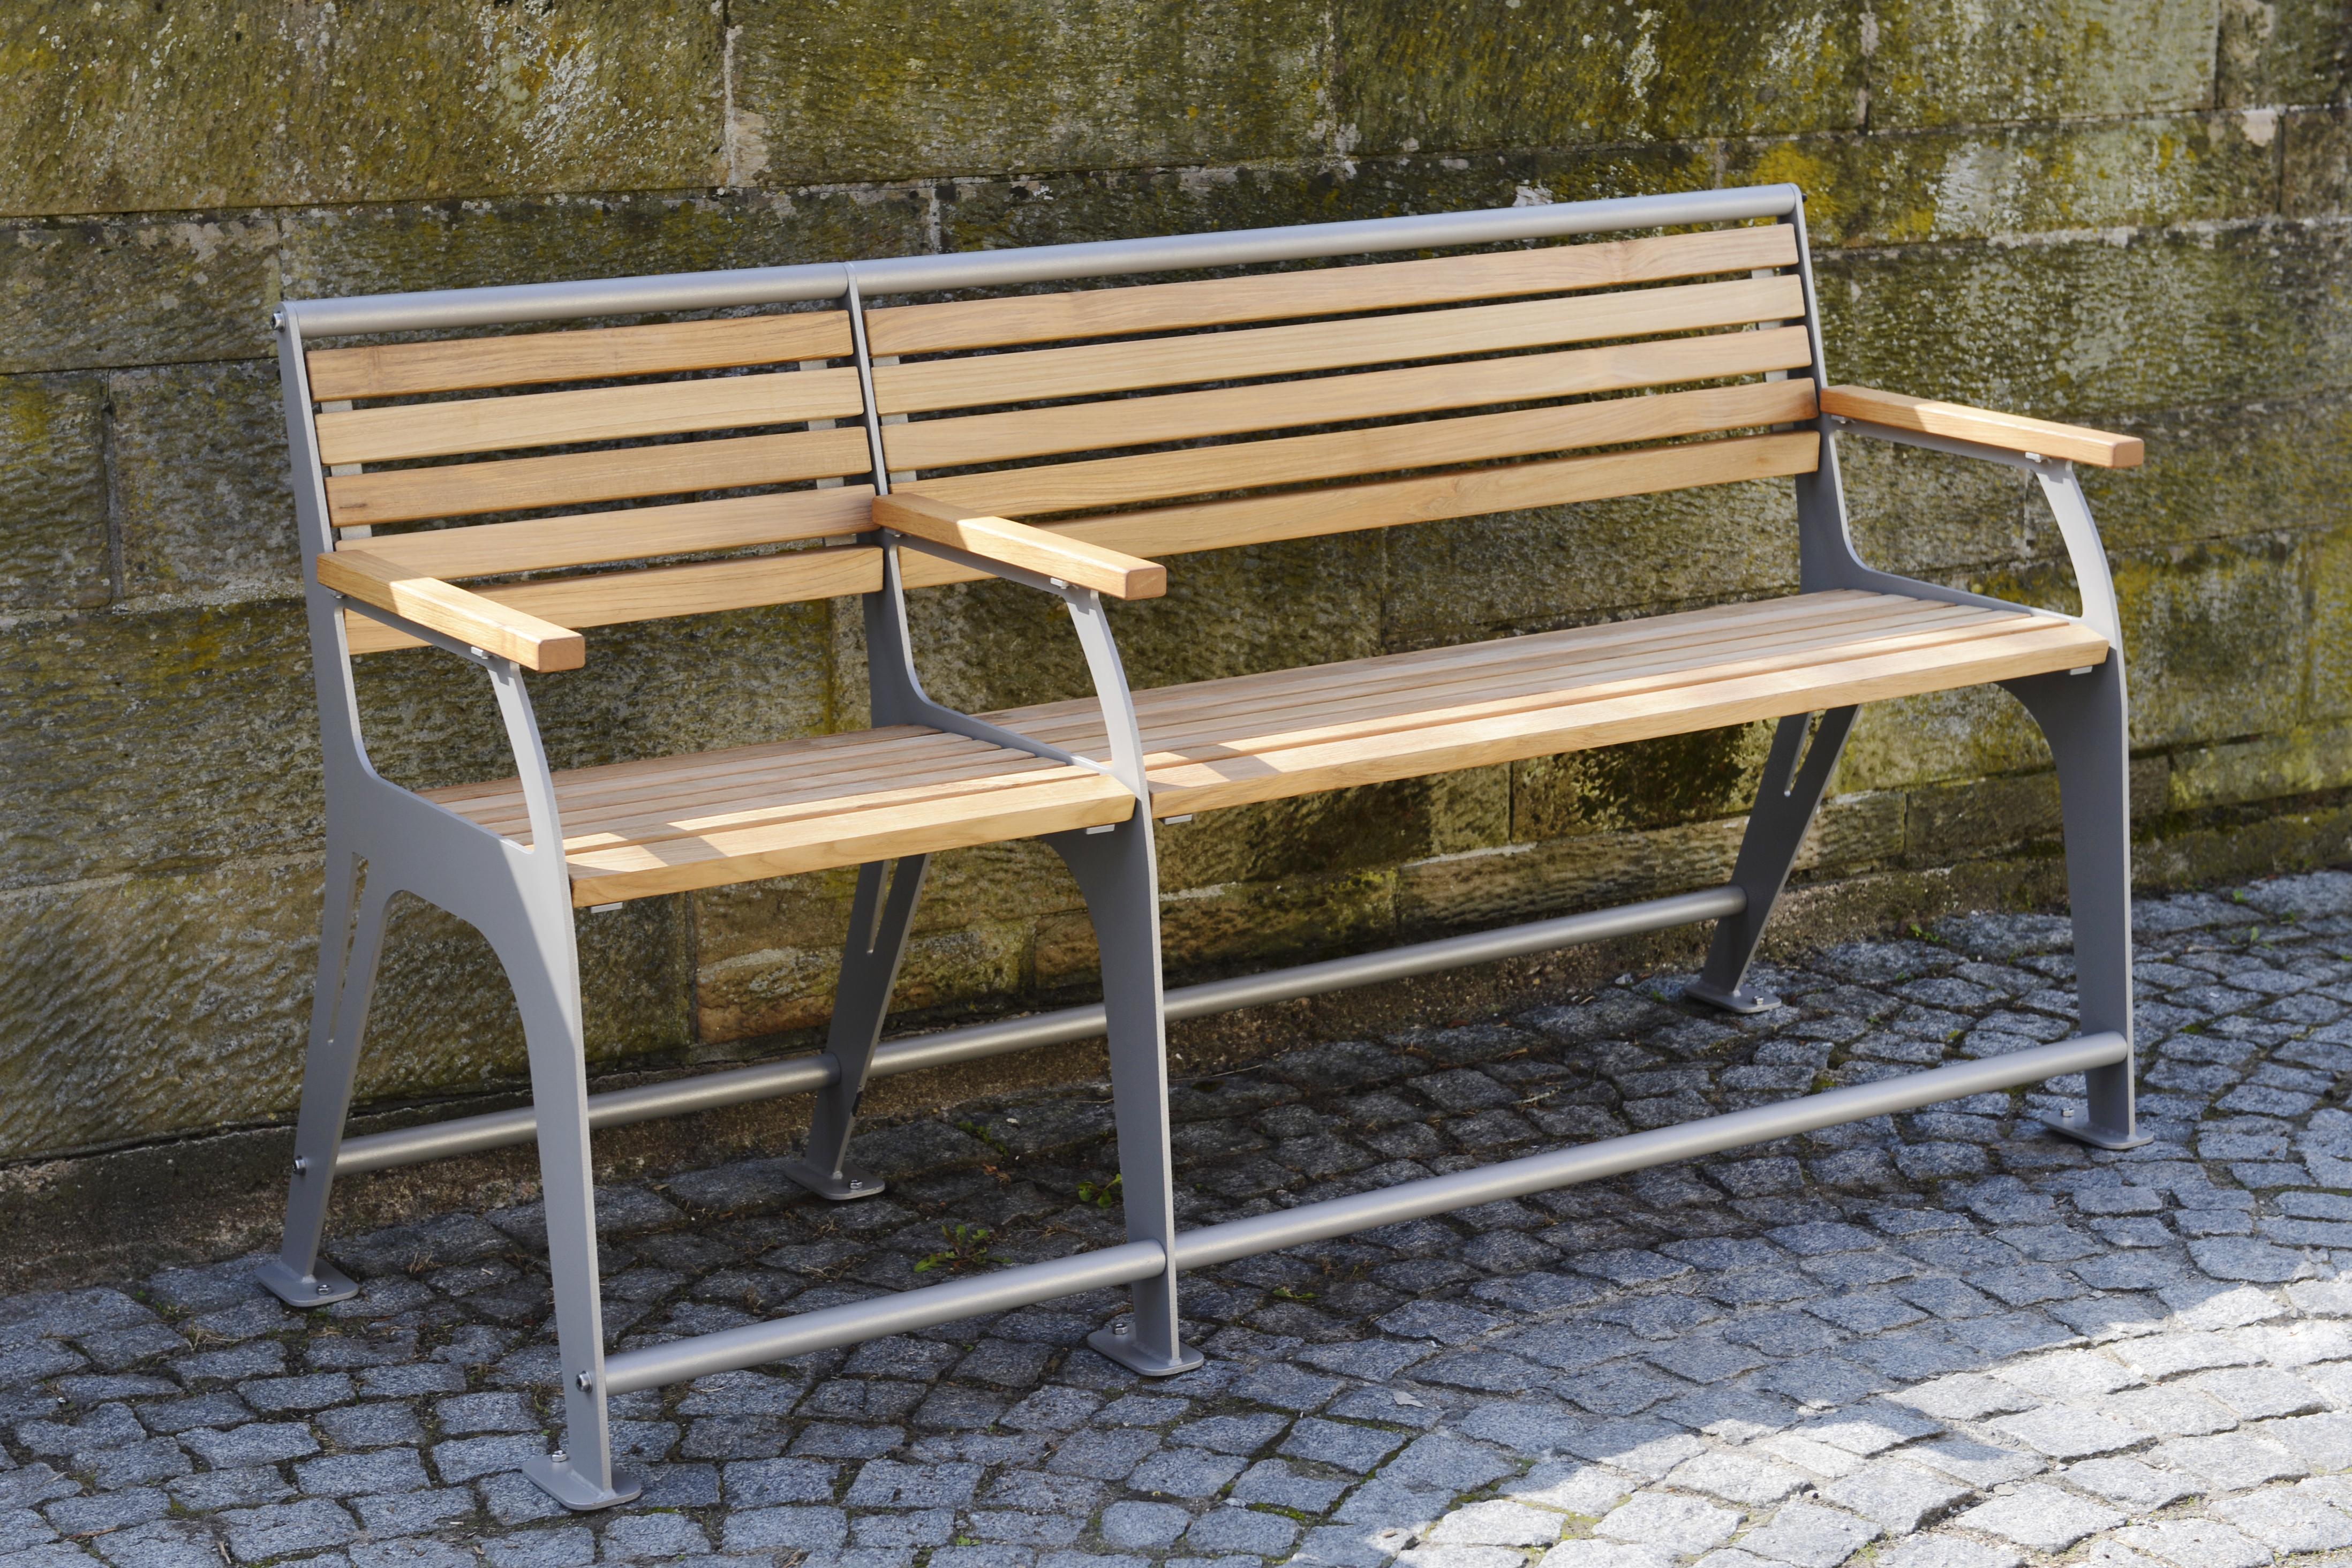 Seniorenbank-Hera-2er-Sitzbank-Einzelsitz-rechts_860542